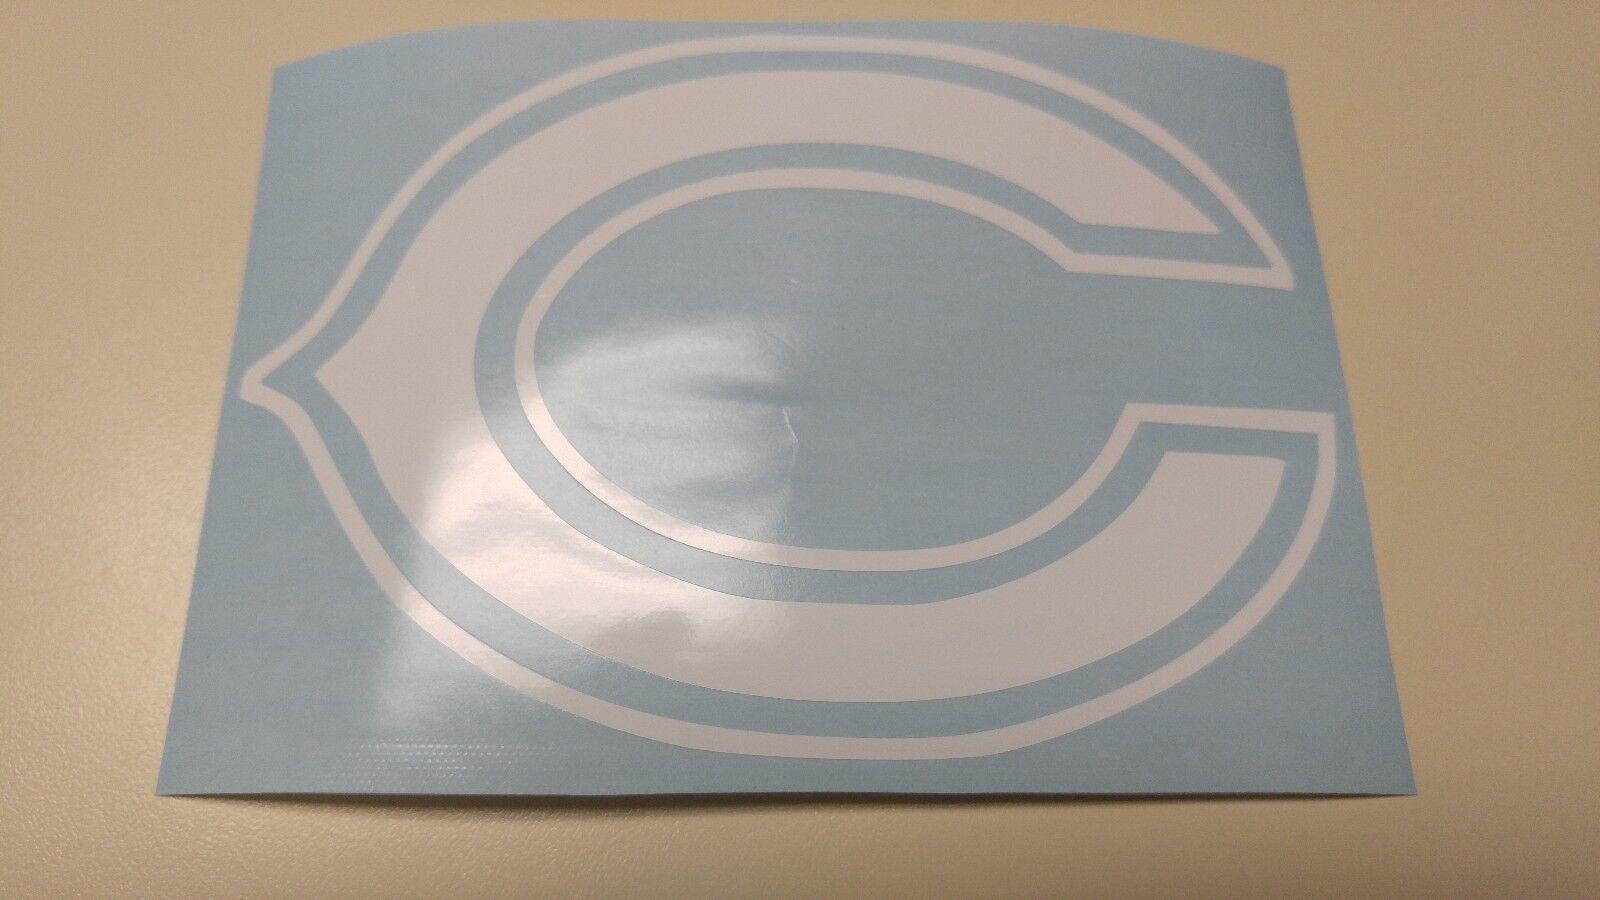 Window Toolbox Sticker #405 NFL Chicago Bears Stickers